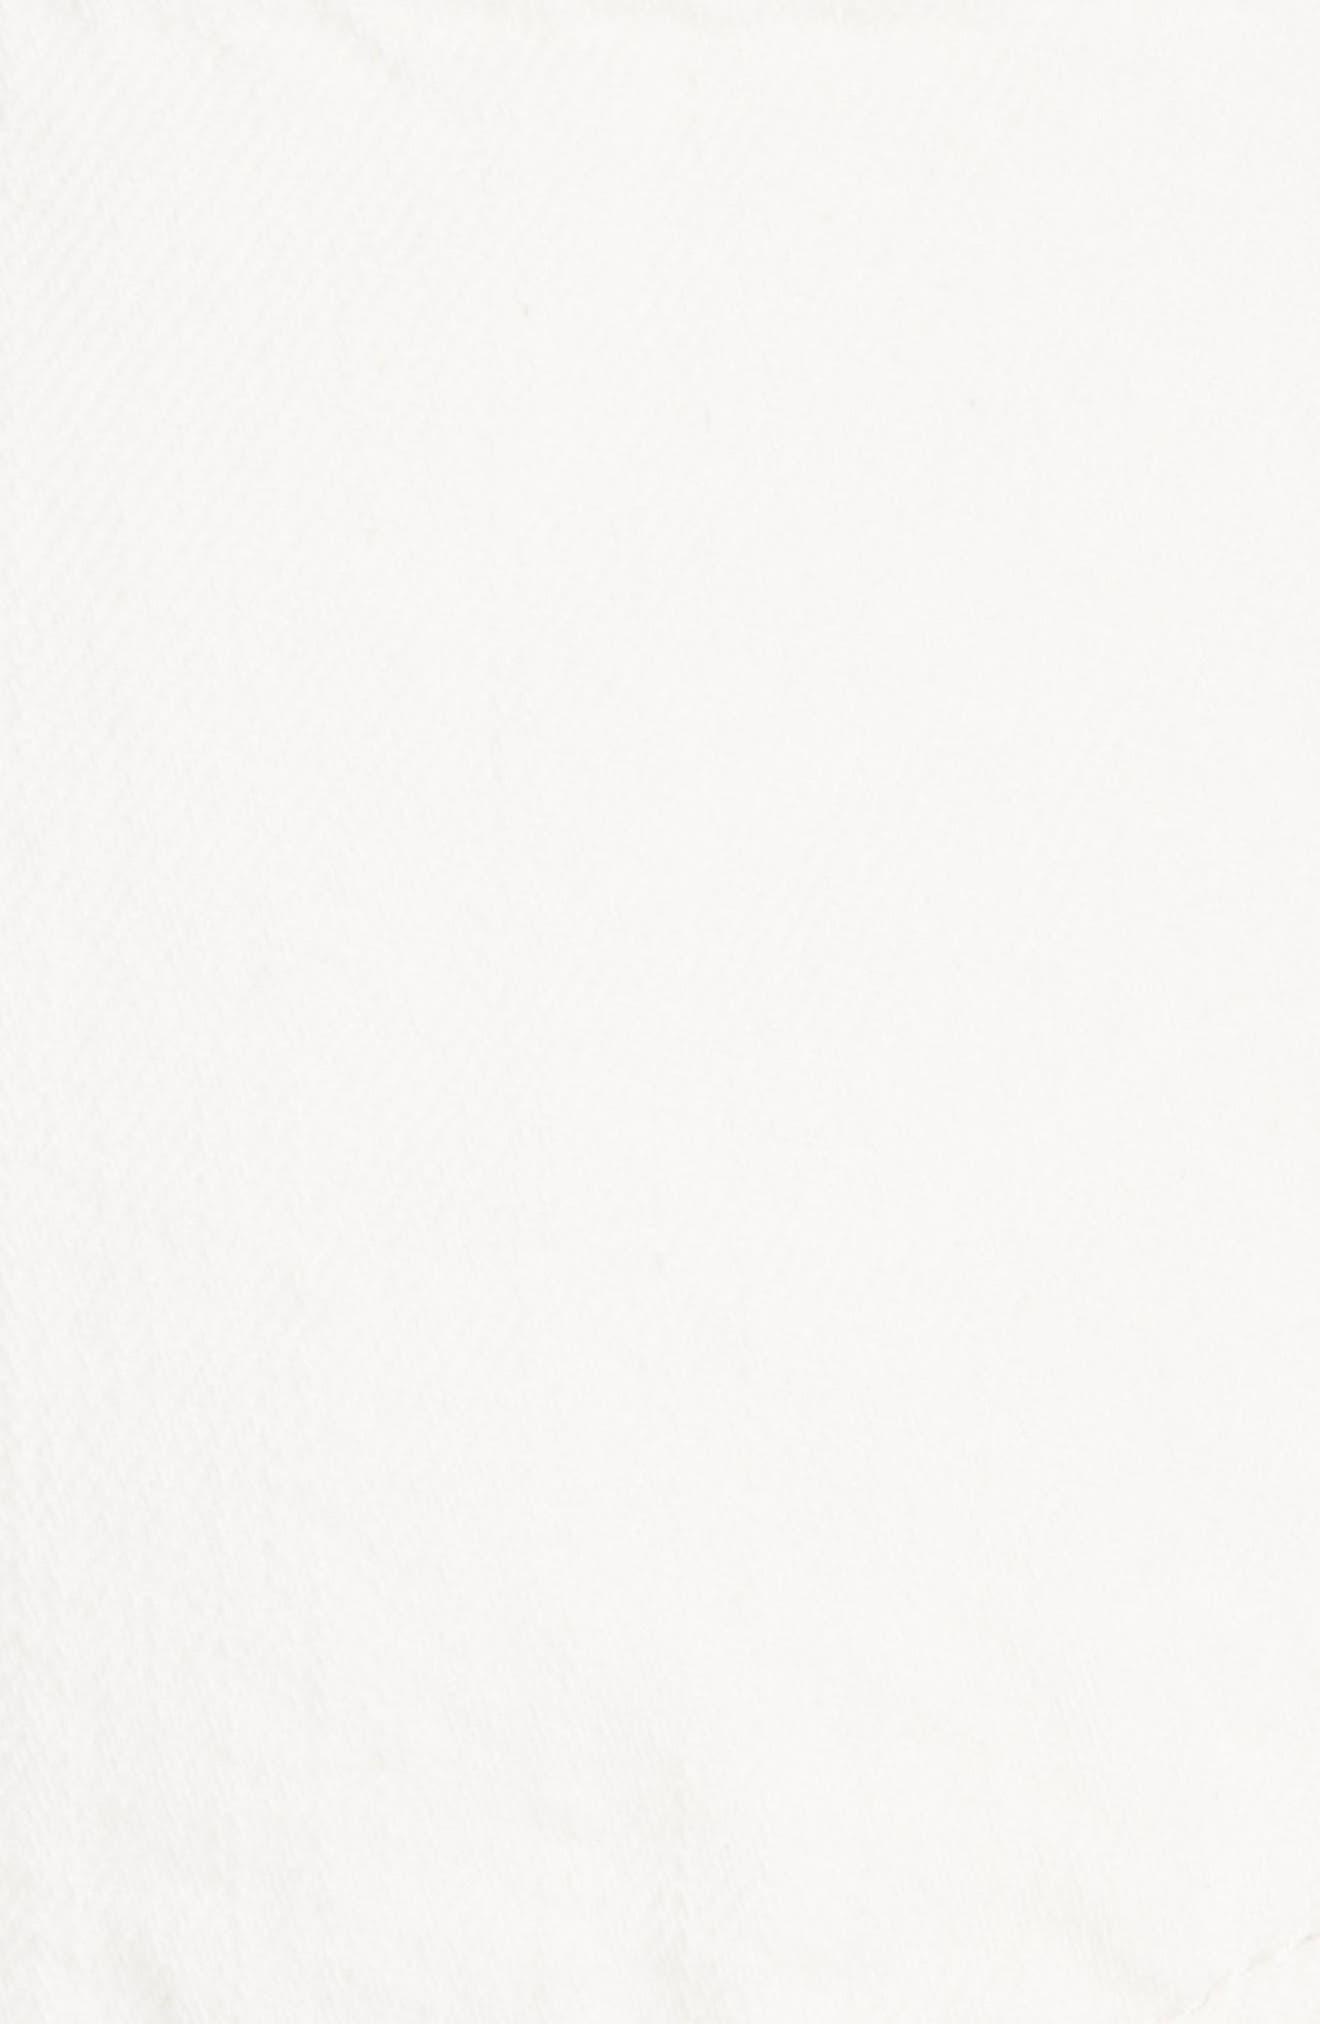 Cutoff Denim Shorts,                             Alternate thumbnail 6, color,                             White